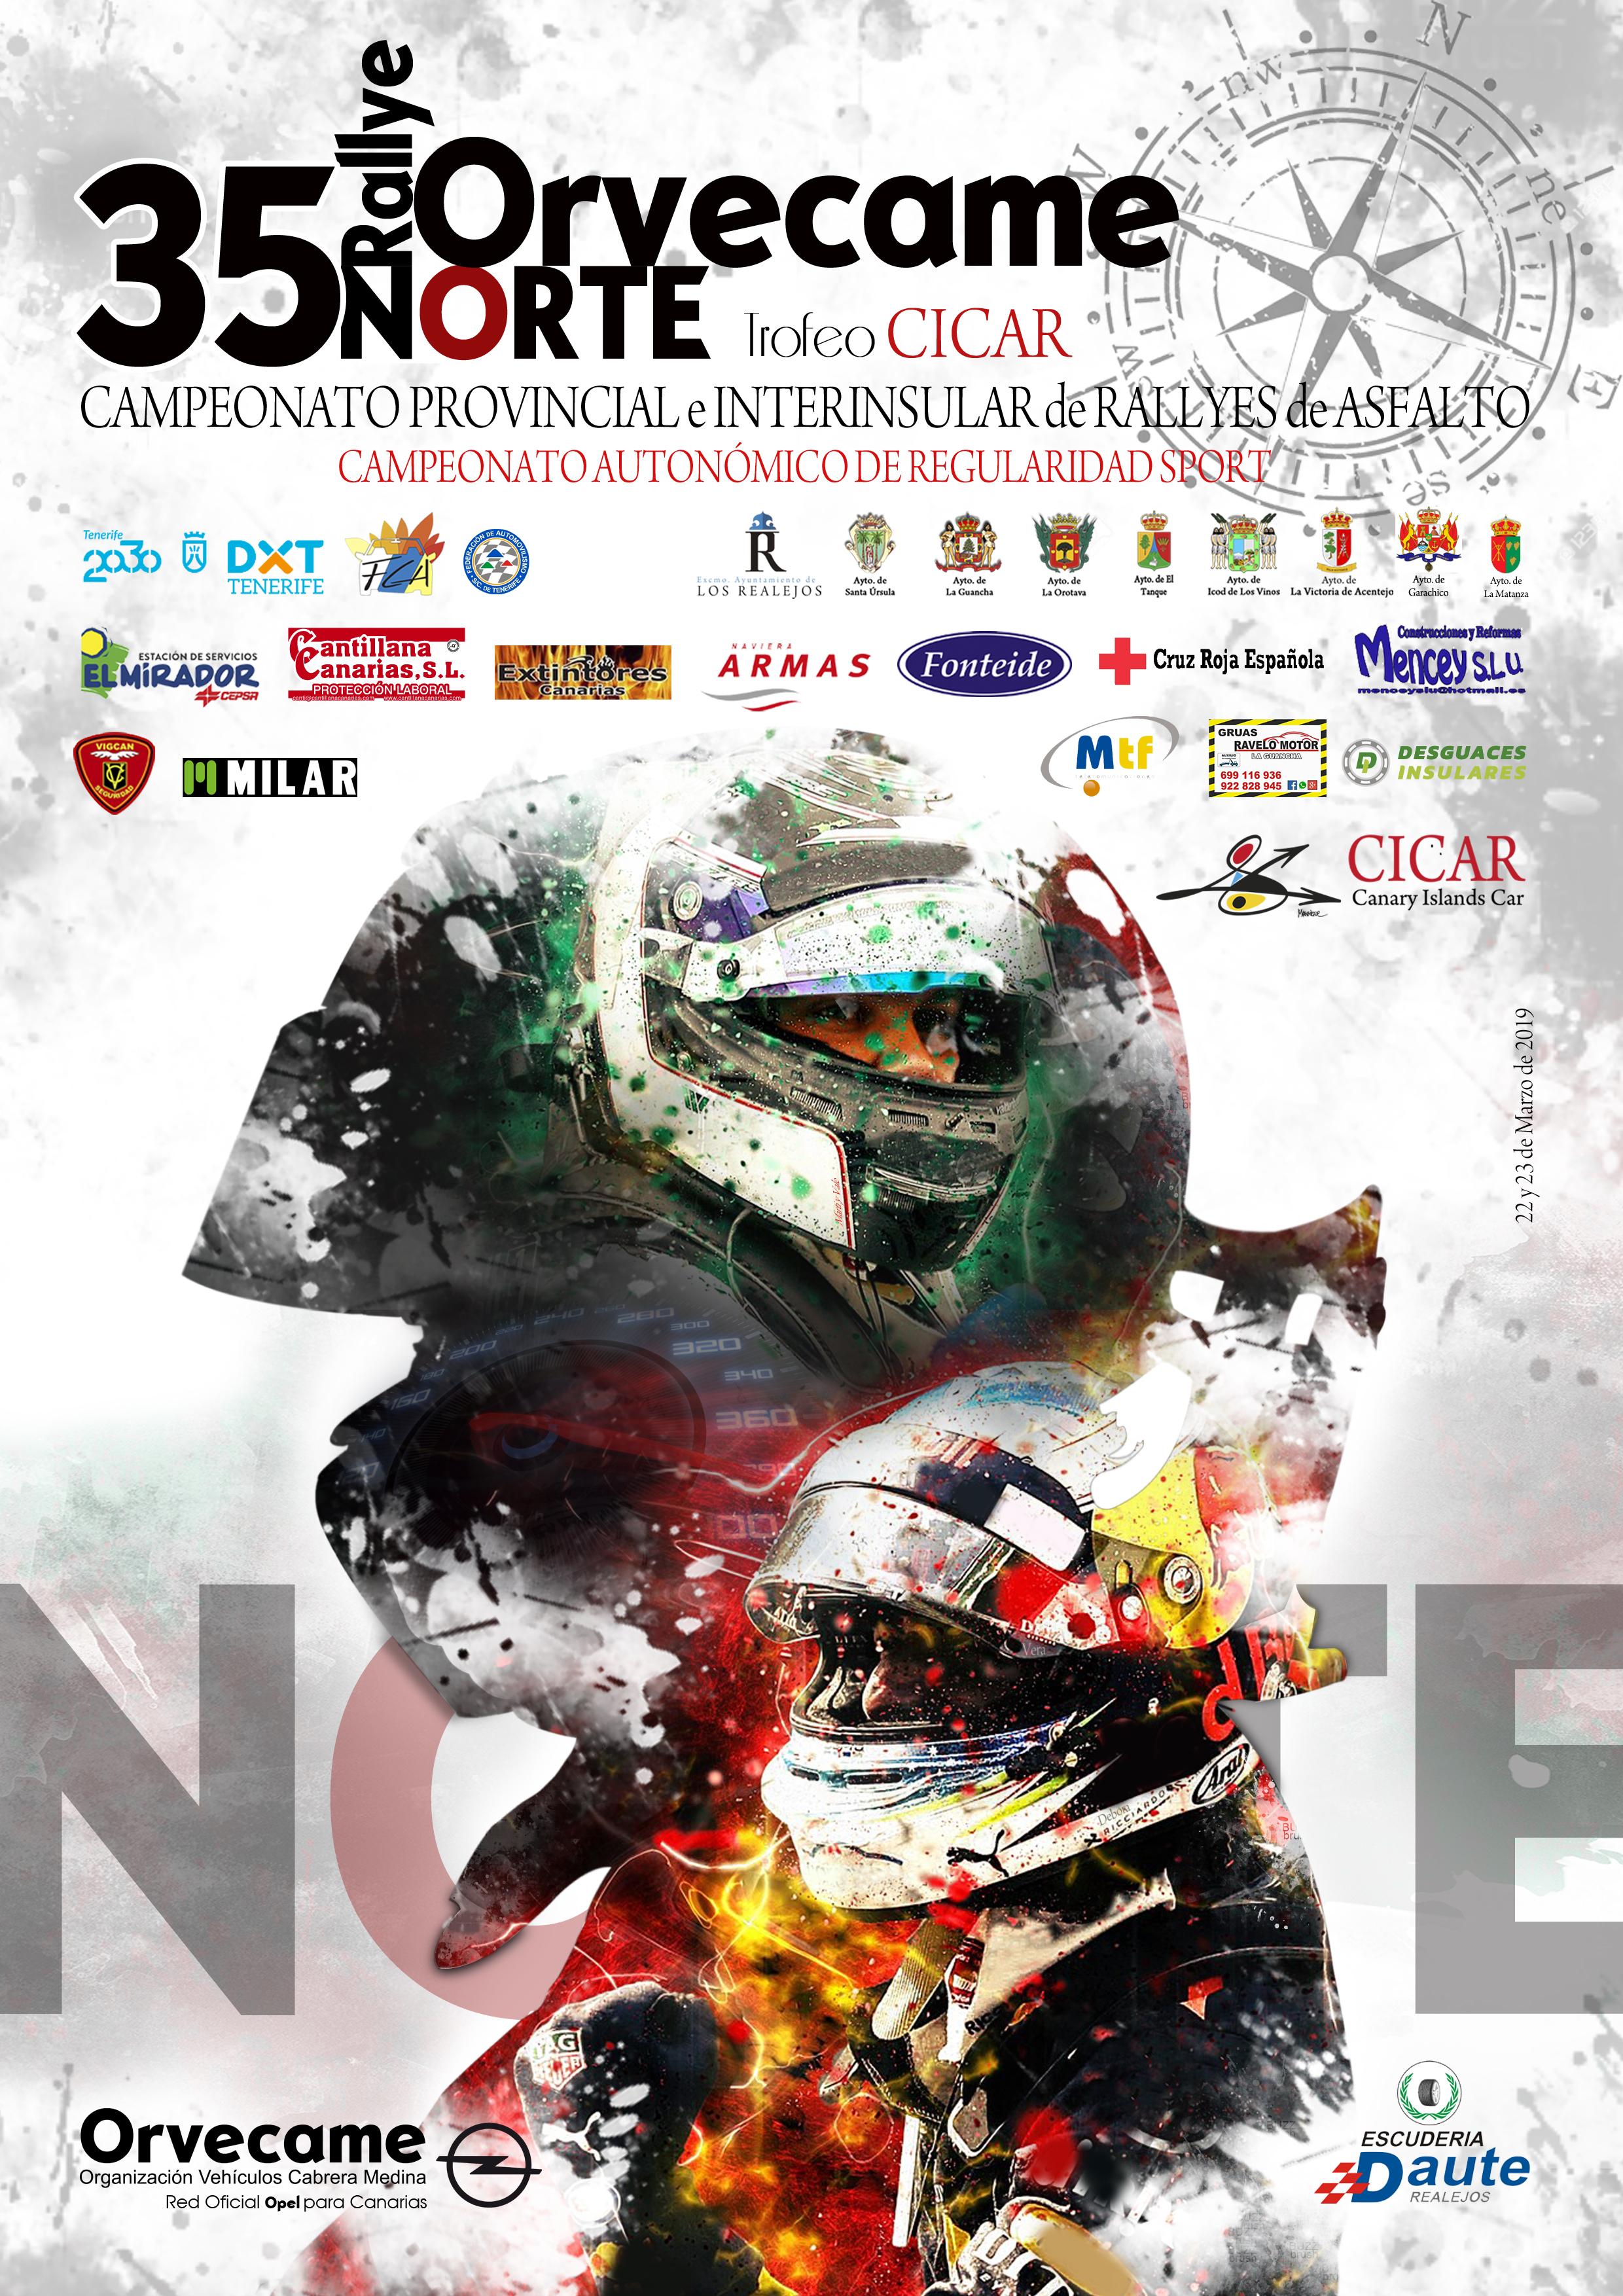 📢 Gran lista de inscritos para empezar la temporada 🏁35º Rallye Orvecame Norte Trofeo Cicar